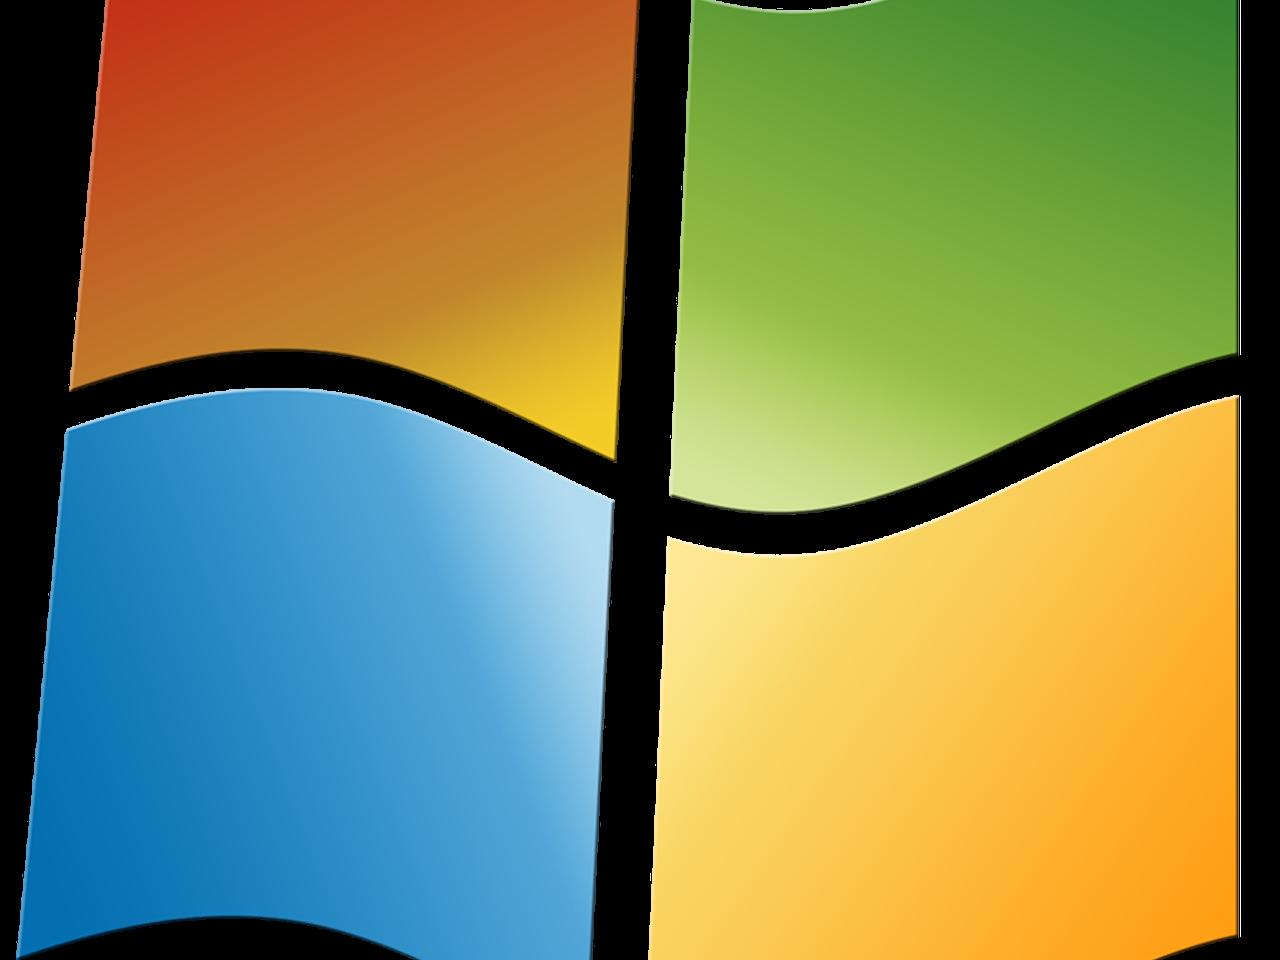 Windows logga